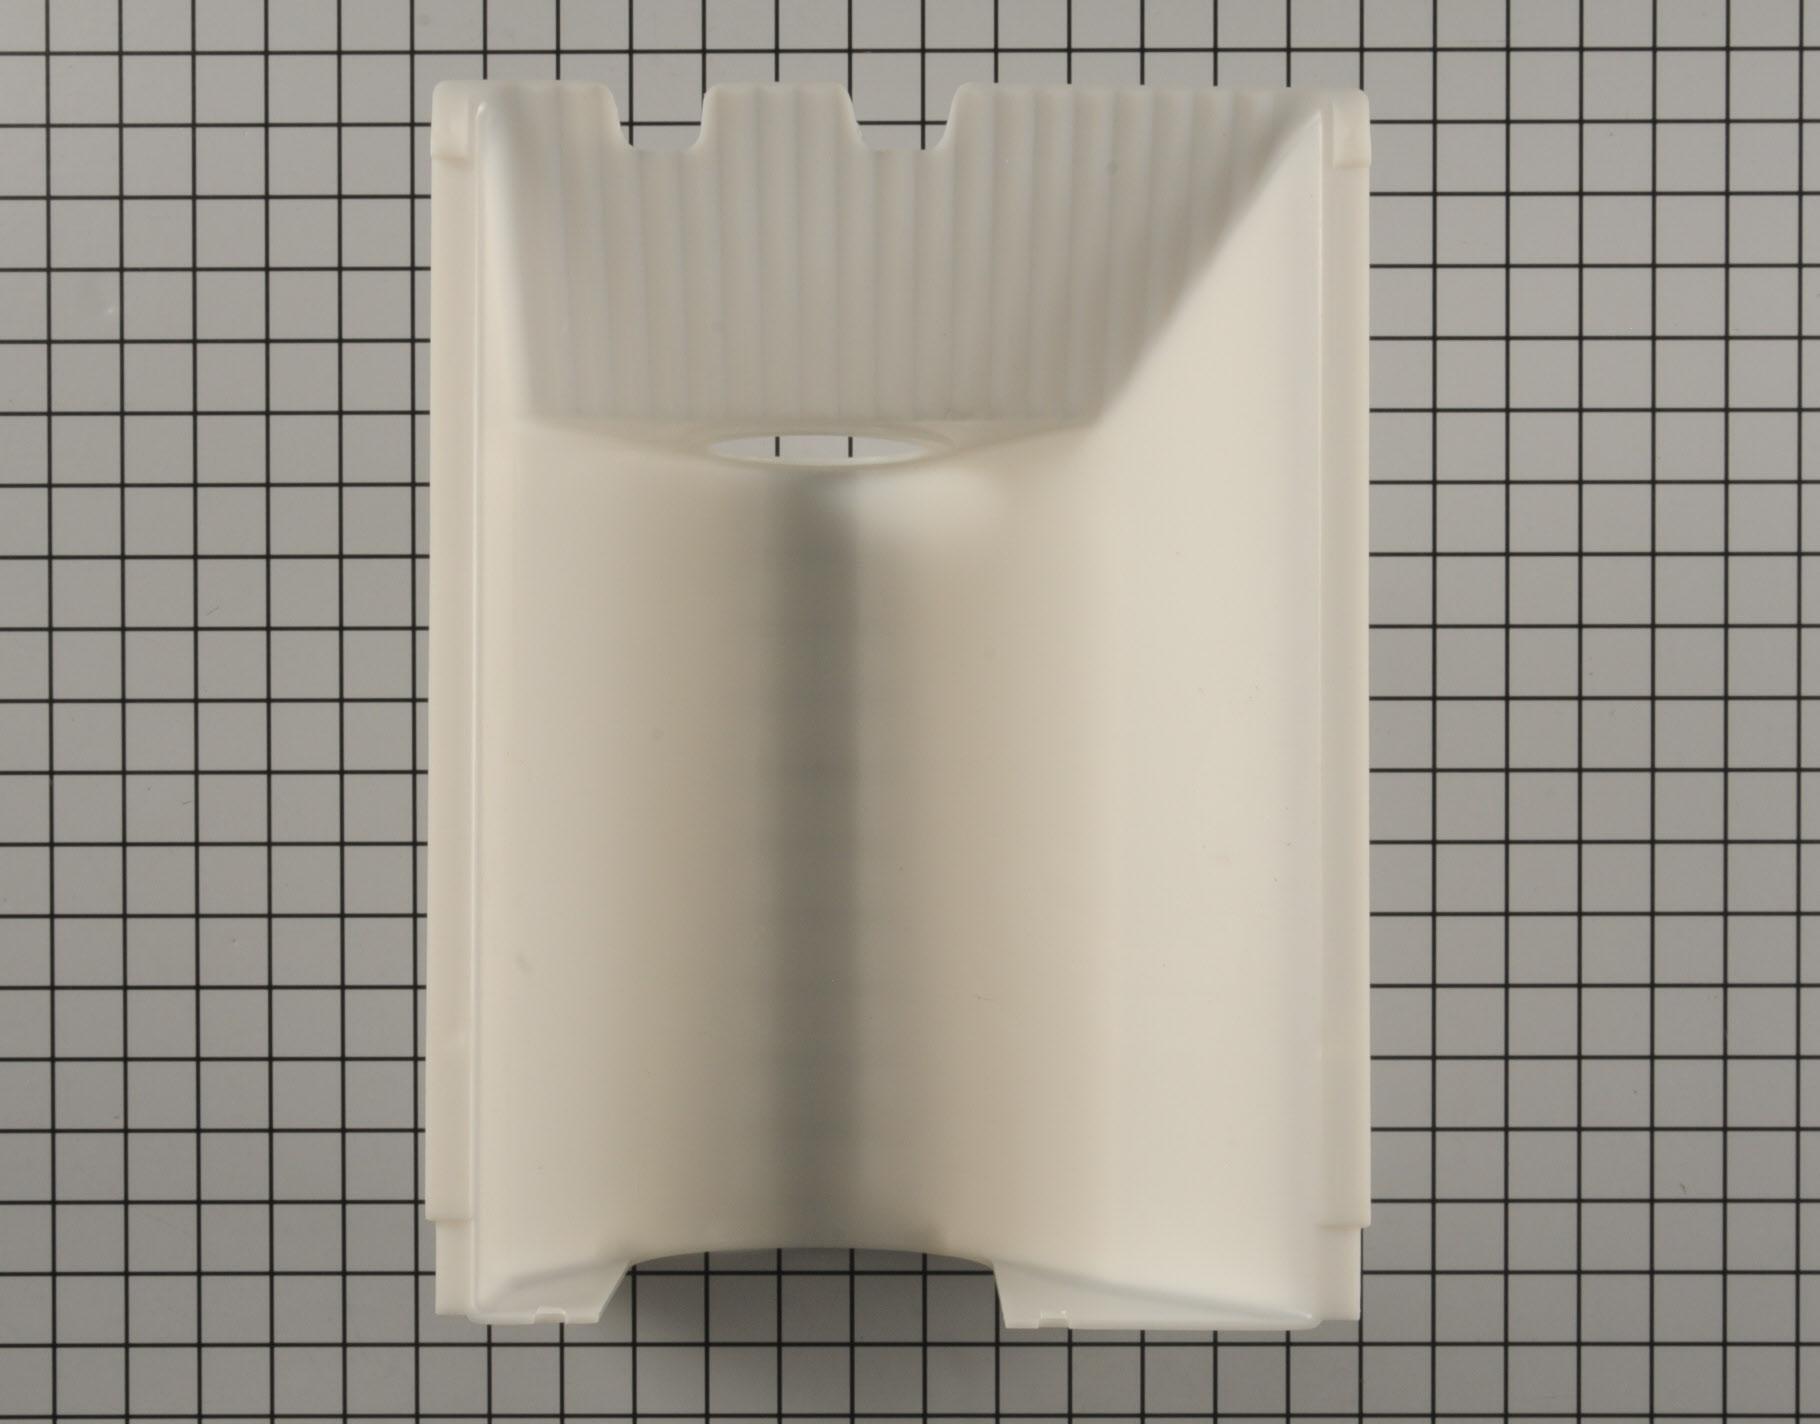 KitchenAid Refrigerator Part # WP10111905 - Ice Bucket